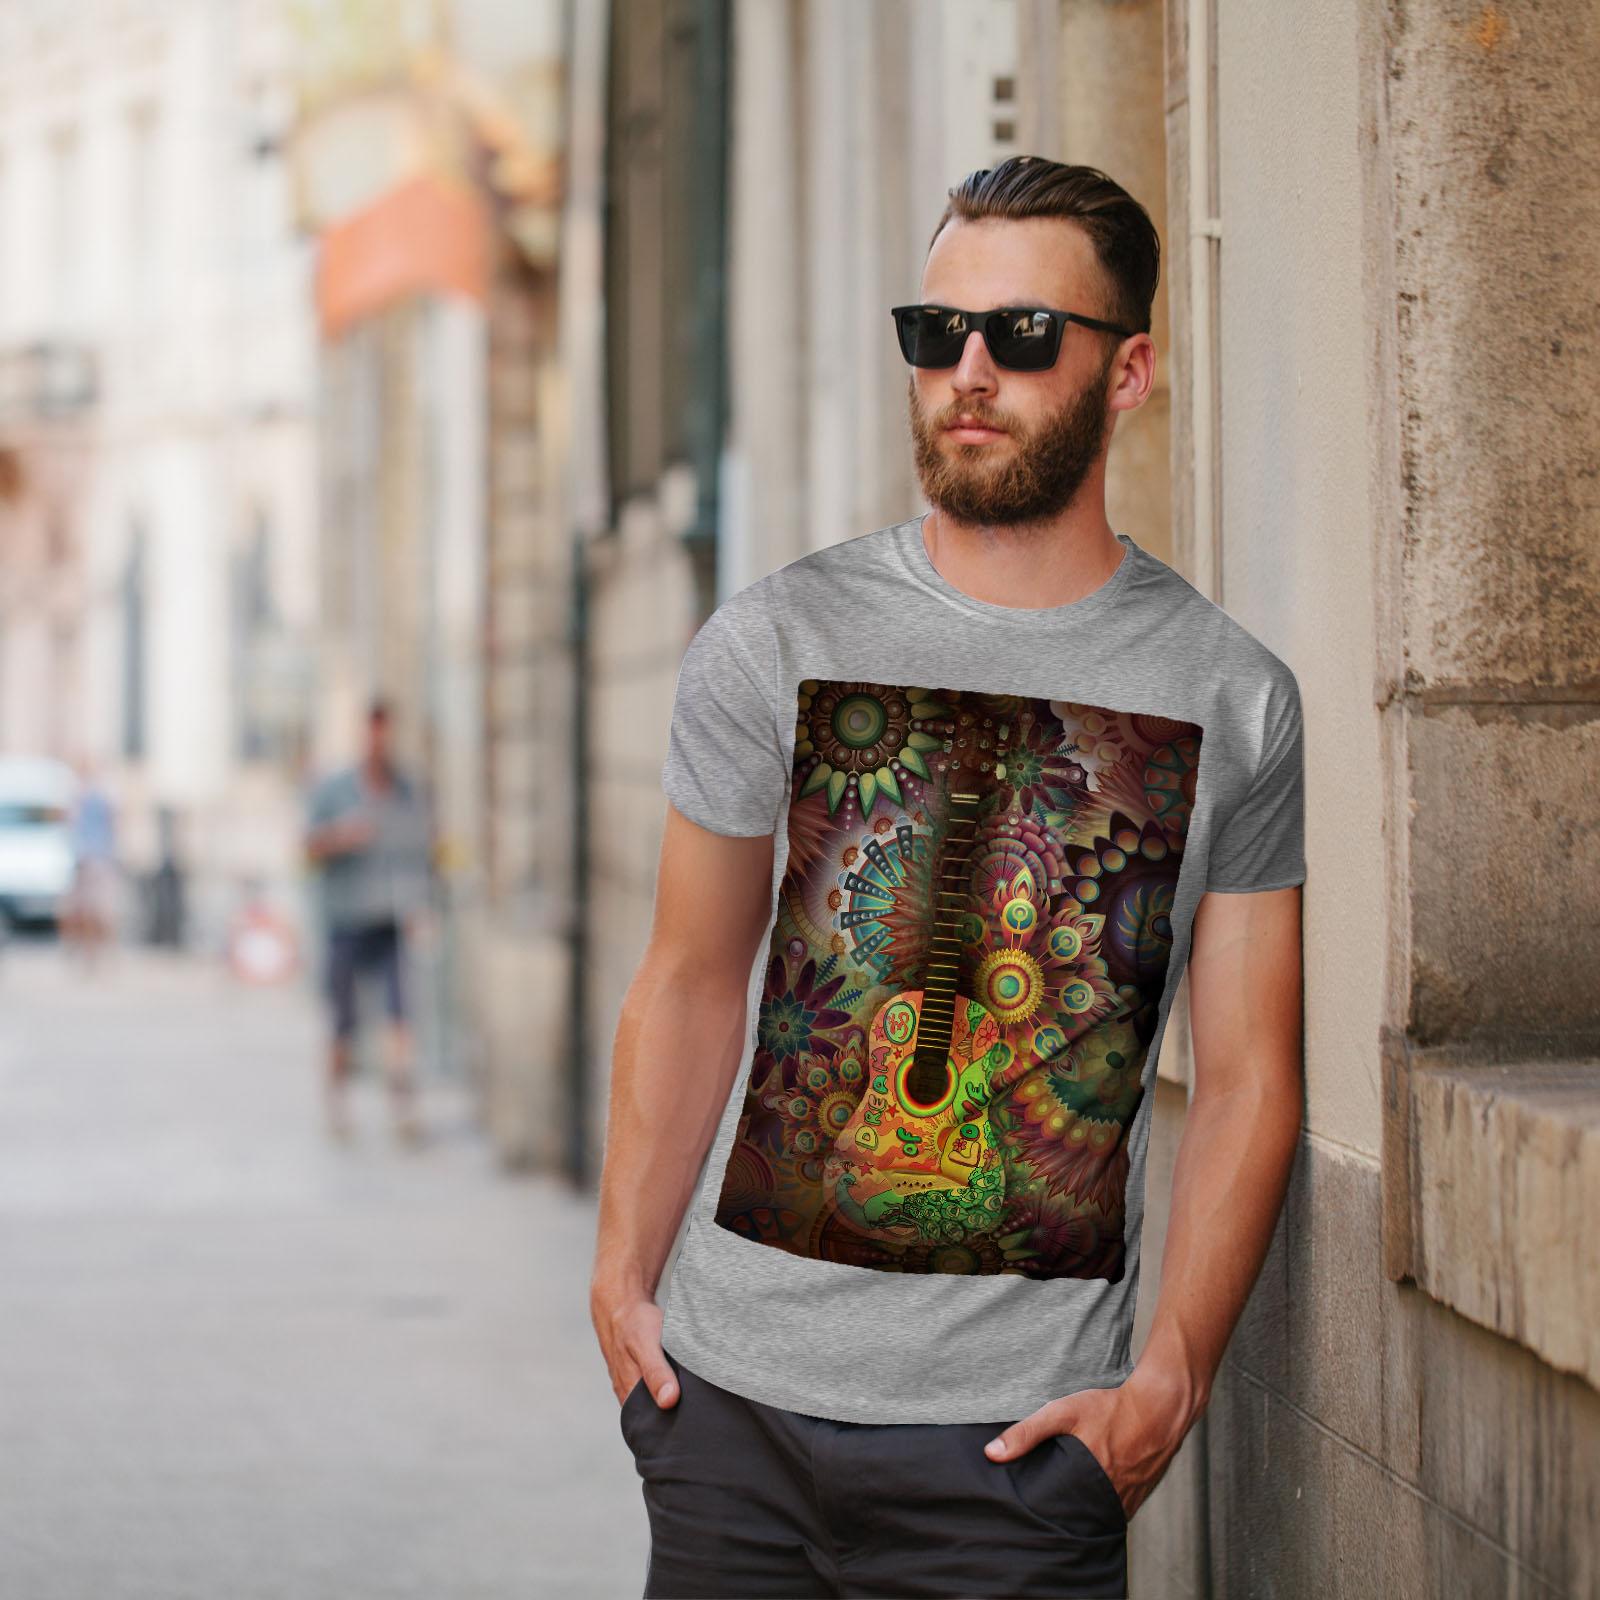 Wellcoda-Colorful-Guitar-Mens-T-shirt-Music-Graphic-Design-Printed-Tee thumbnail 17